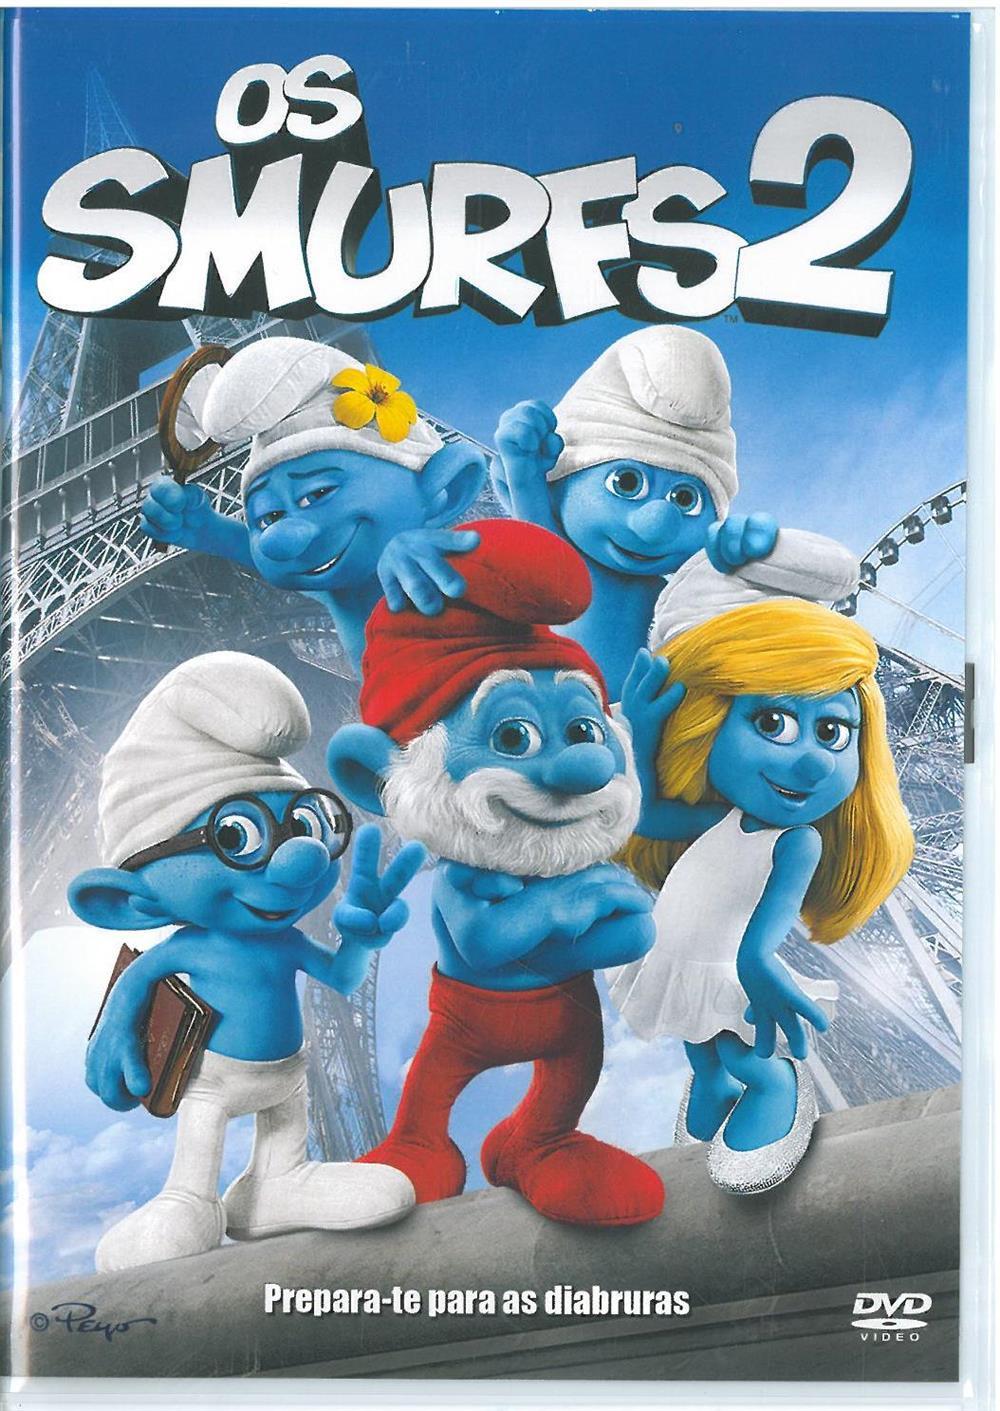 Os smurfs 2_DVD.jpg